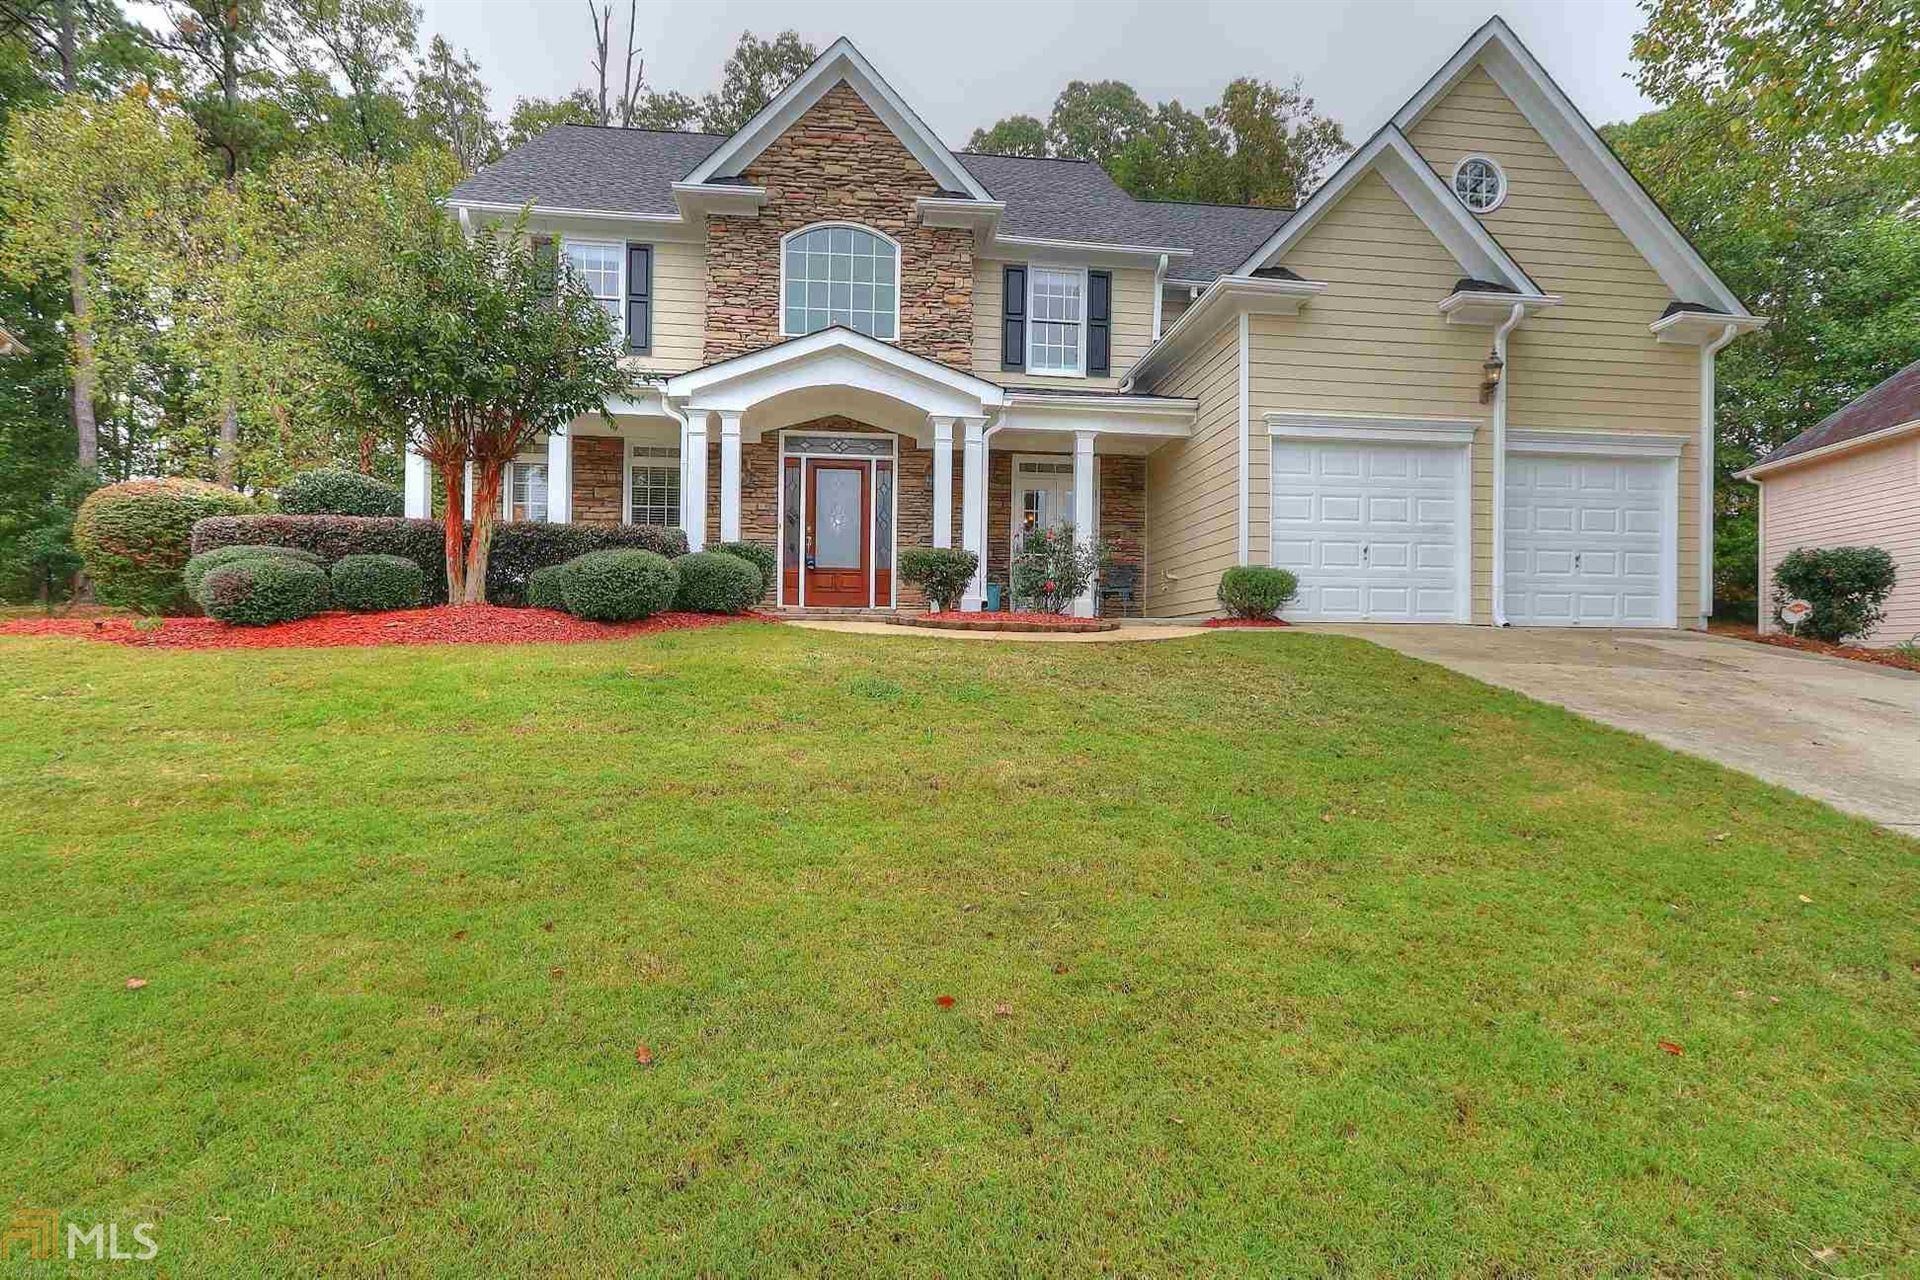 1362 Dayspring Trce, Lawrenceville, GA 30045 - MLS#: 8880560